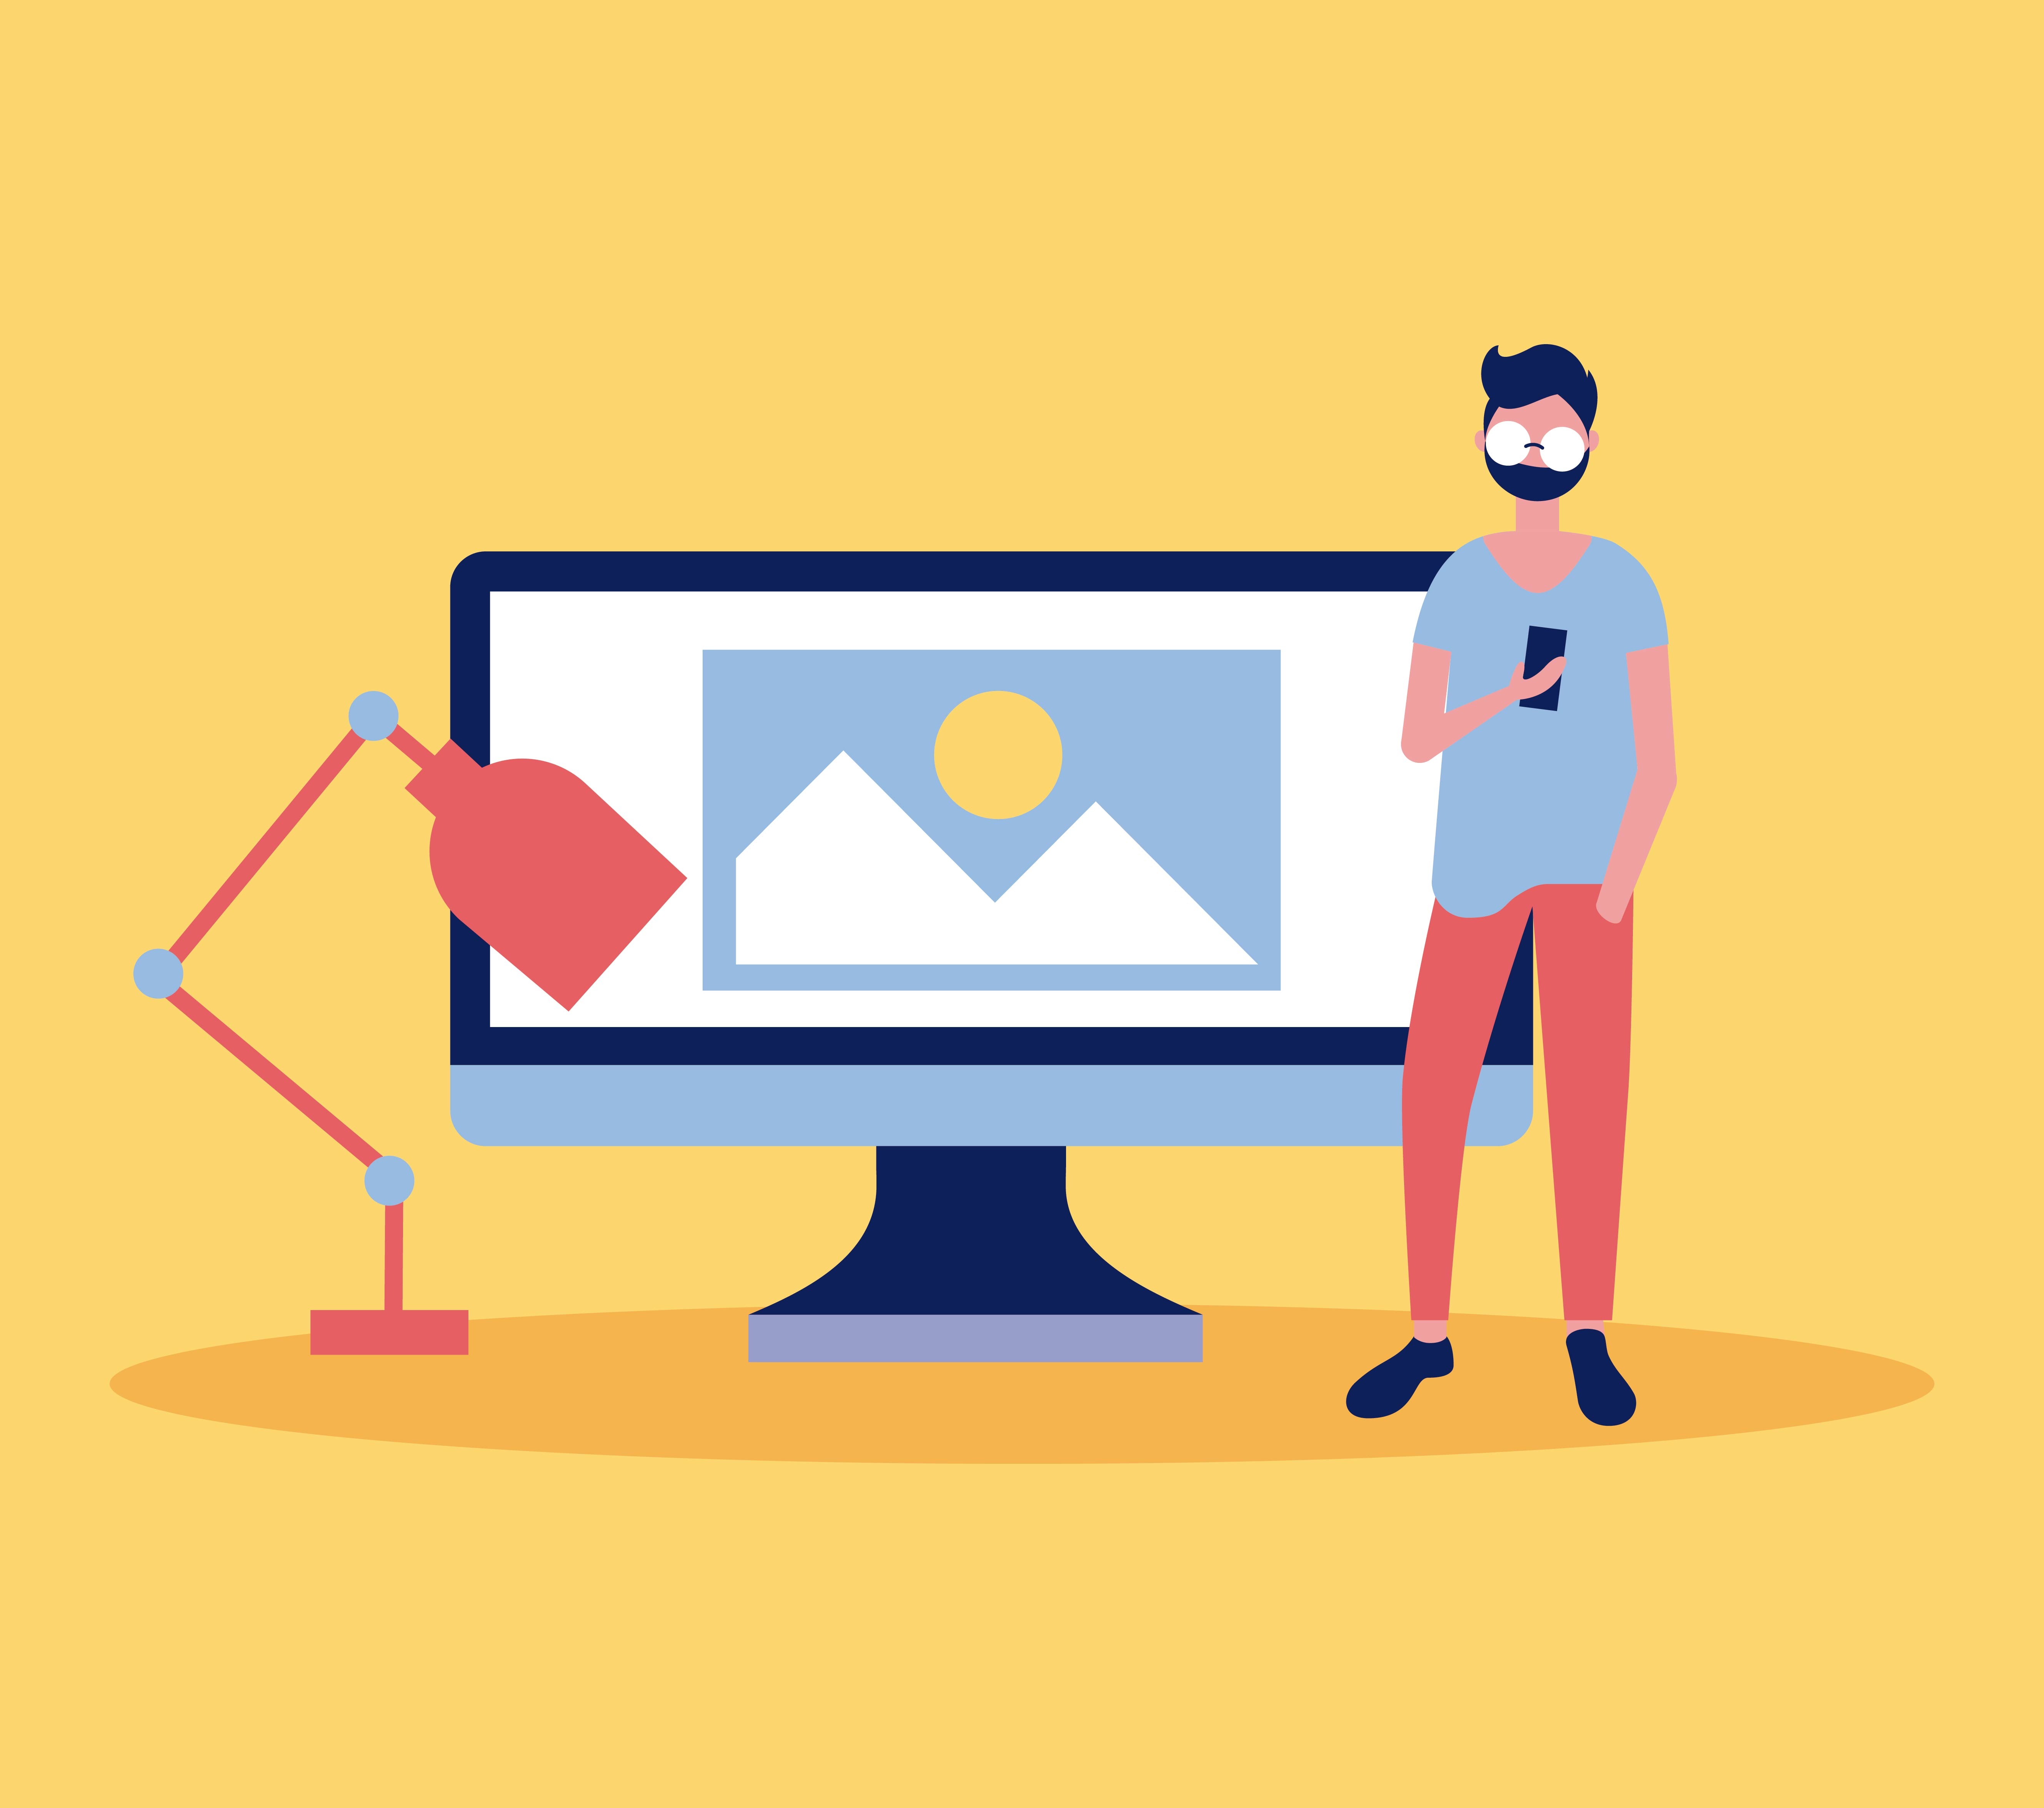 Designer Man In Front Of Computer And Lamp Download Free Vectors Clipart Graphics Vector Art